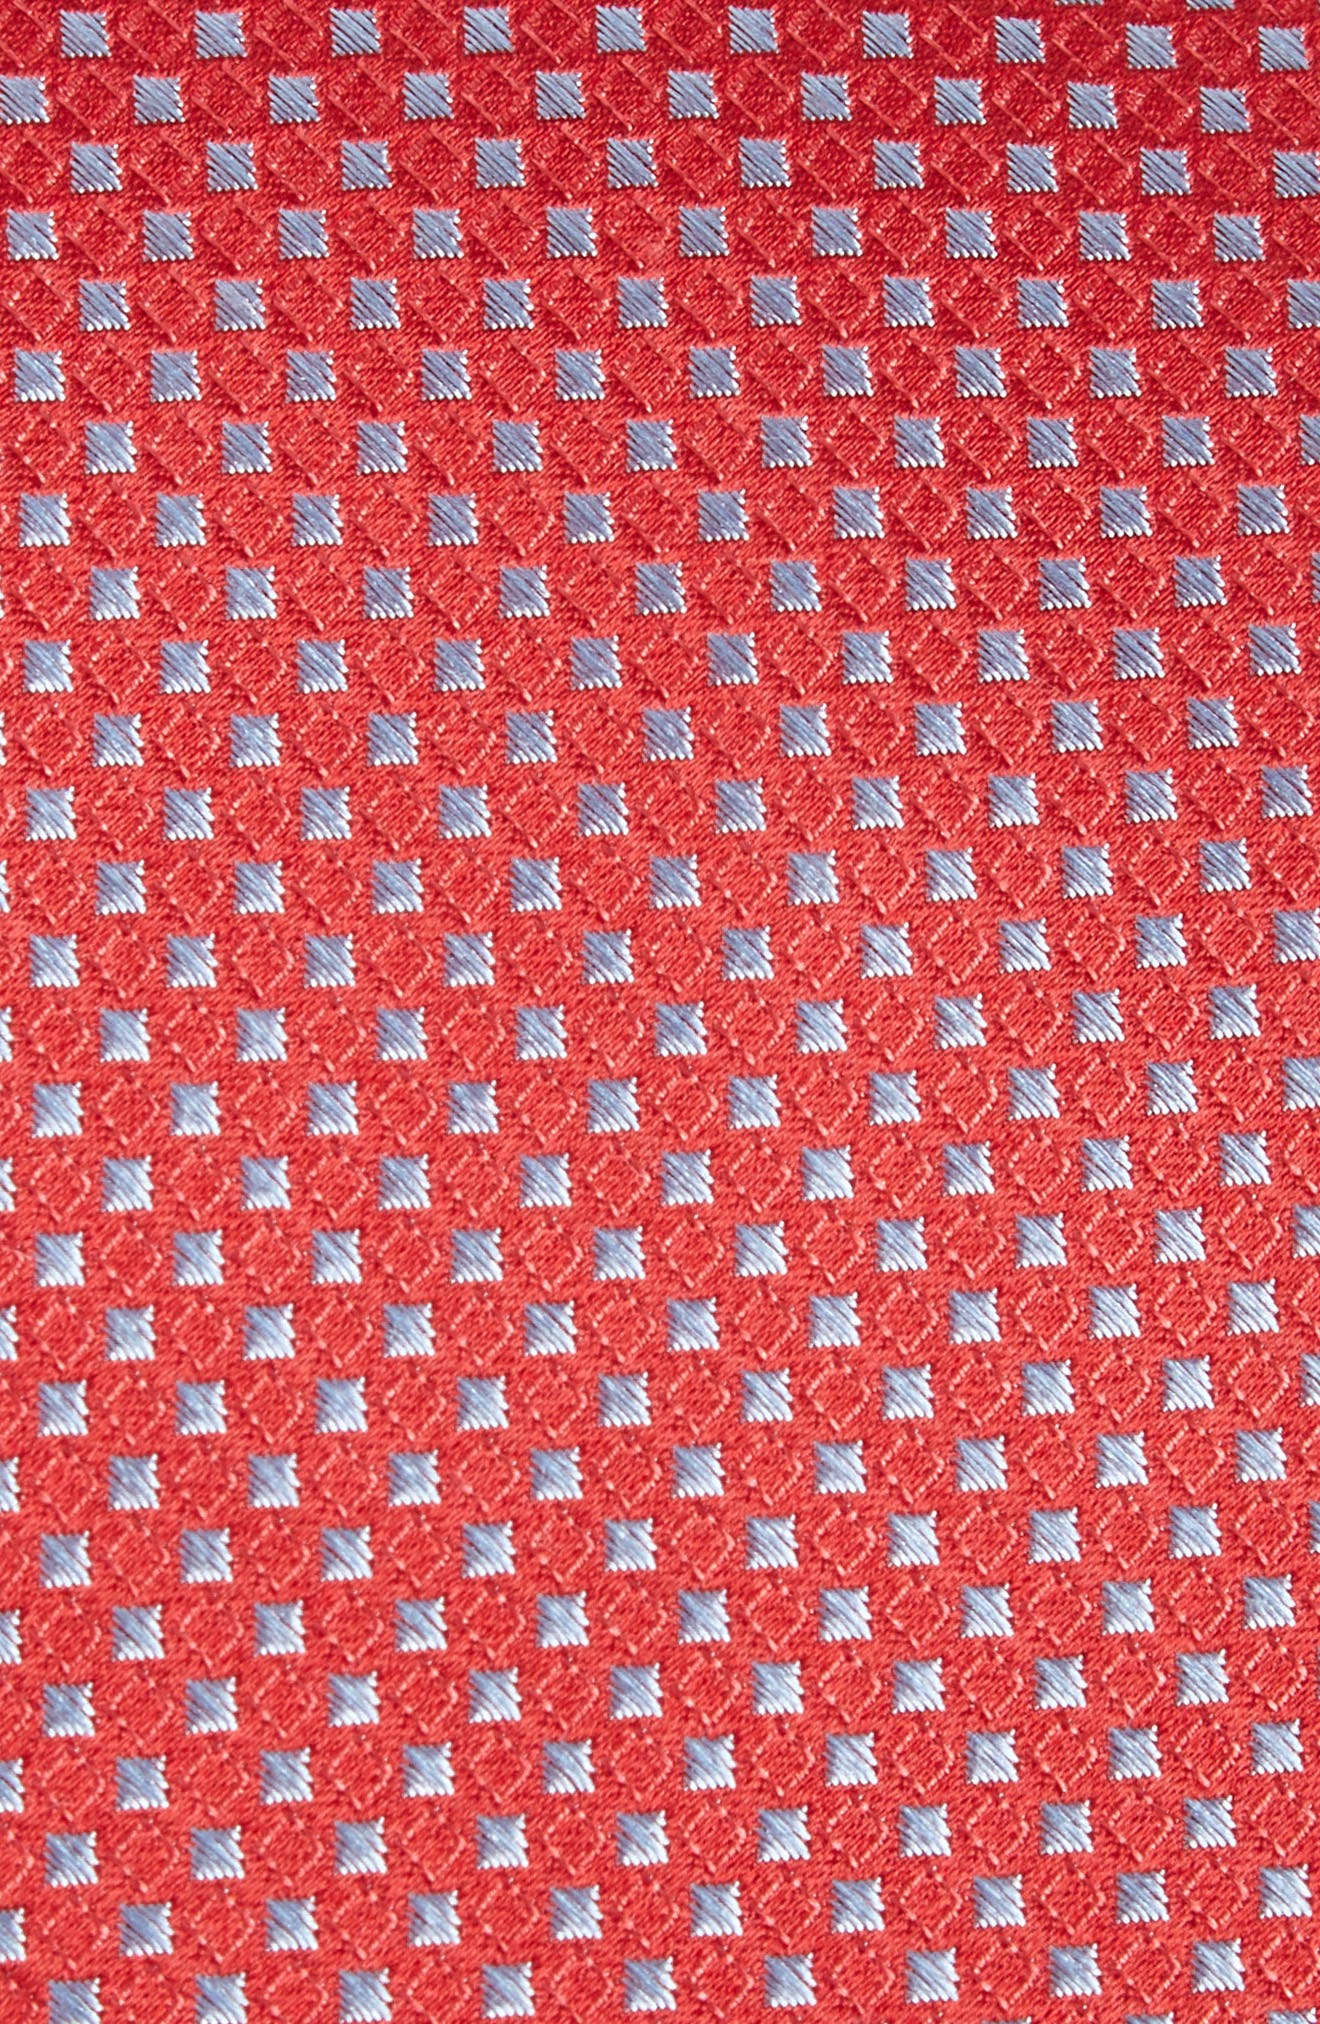 Chad Microdot Silk Tie,                             Alternate thumbnail 15, color,